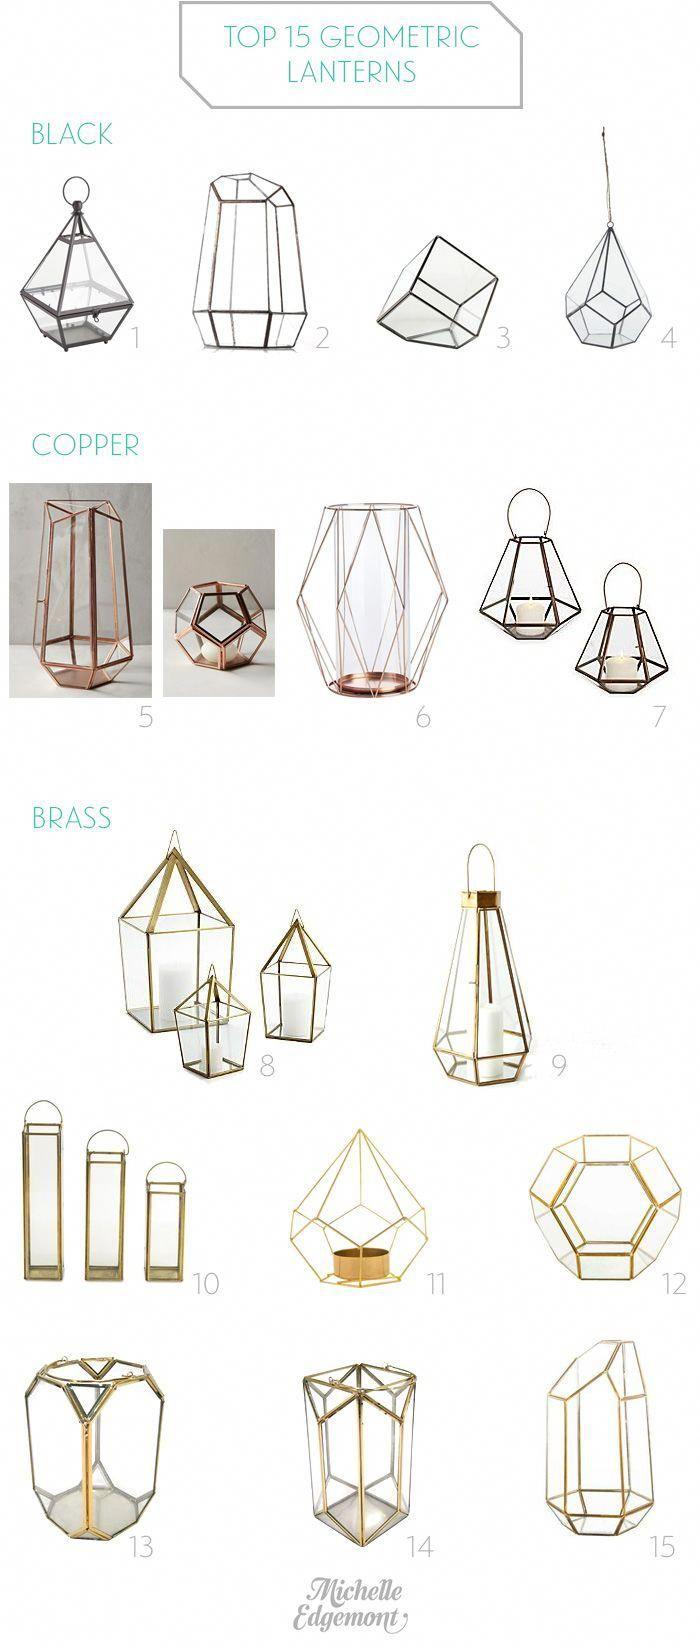 Top 15 Geometric Lanterns